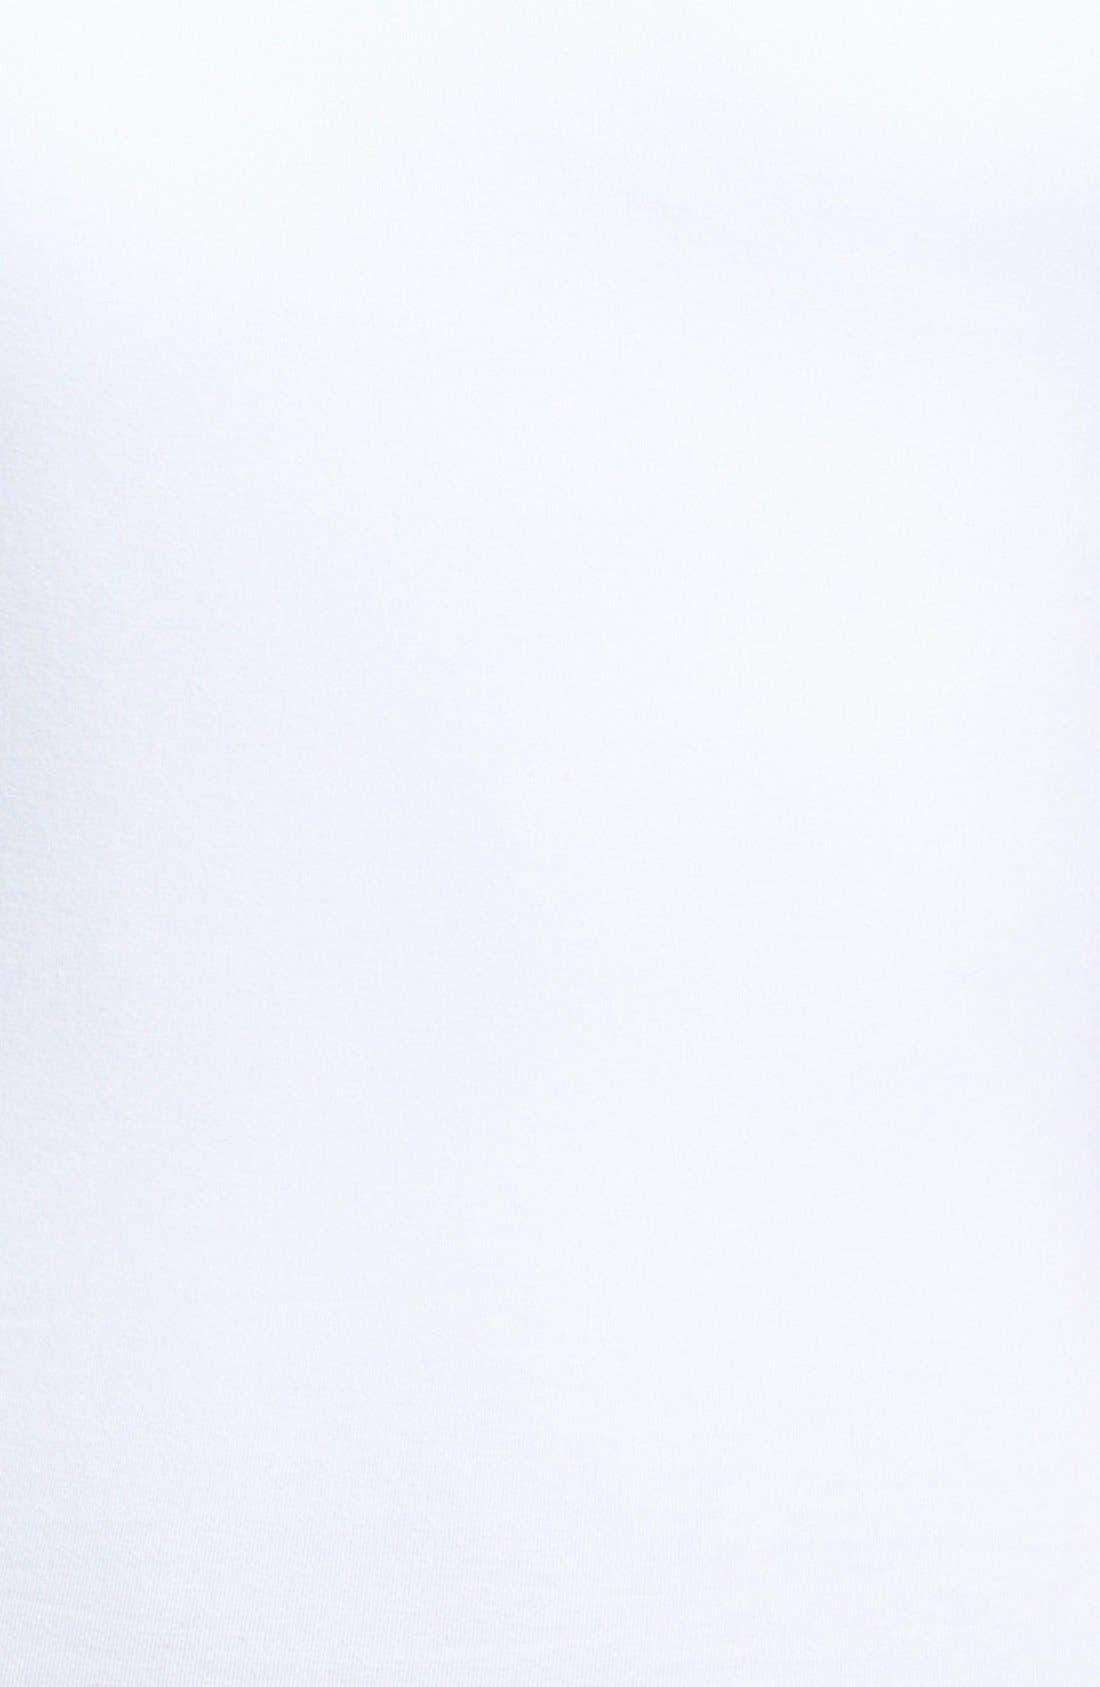 Alternate Image 3  - Yummie Tummie 'Regean' Convertible Strap Camisole